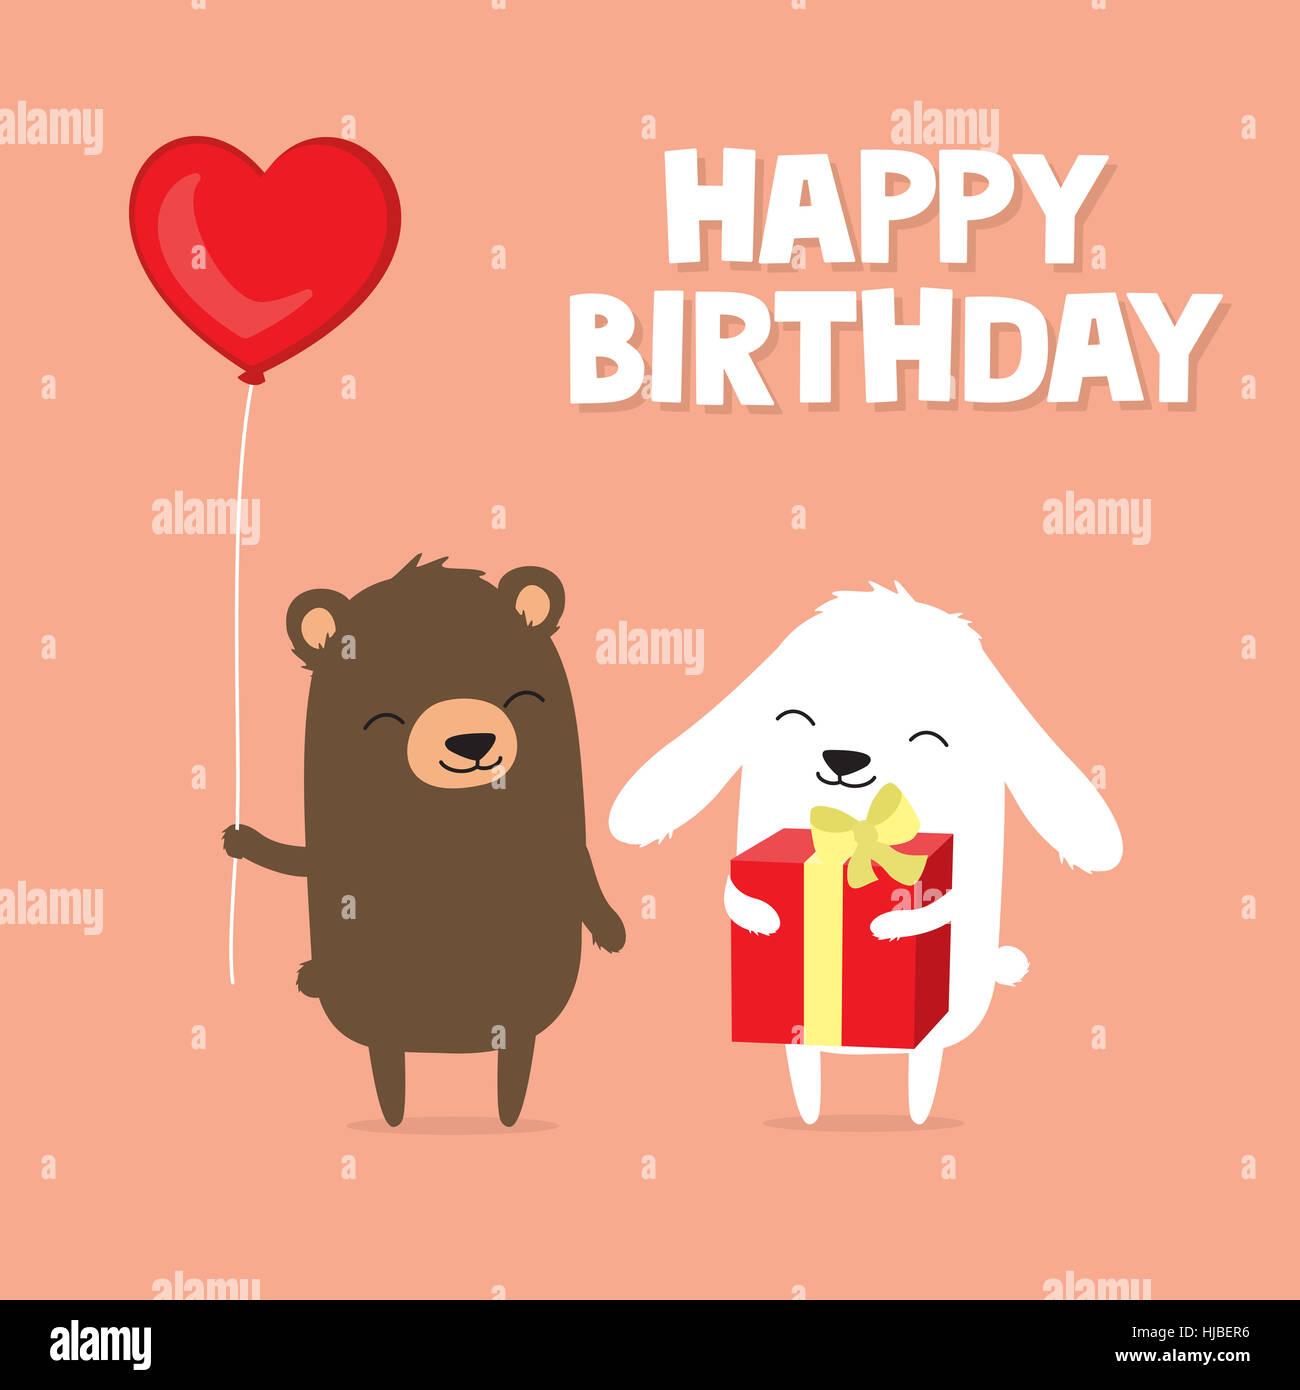 Birthday Greeting Card With Cute Cartoon Bear And Bunny Rabbit Holding Balloon Gift